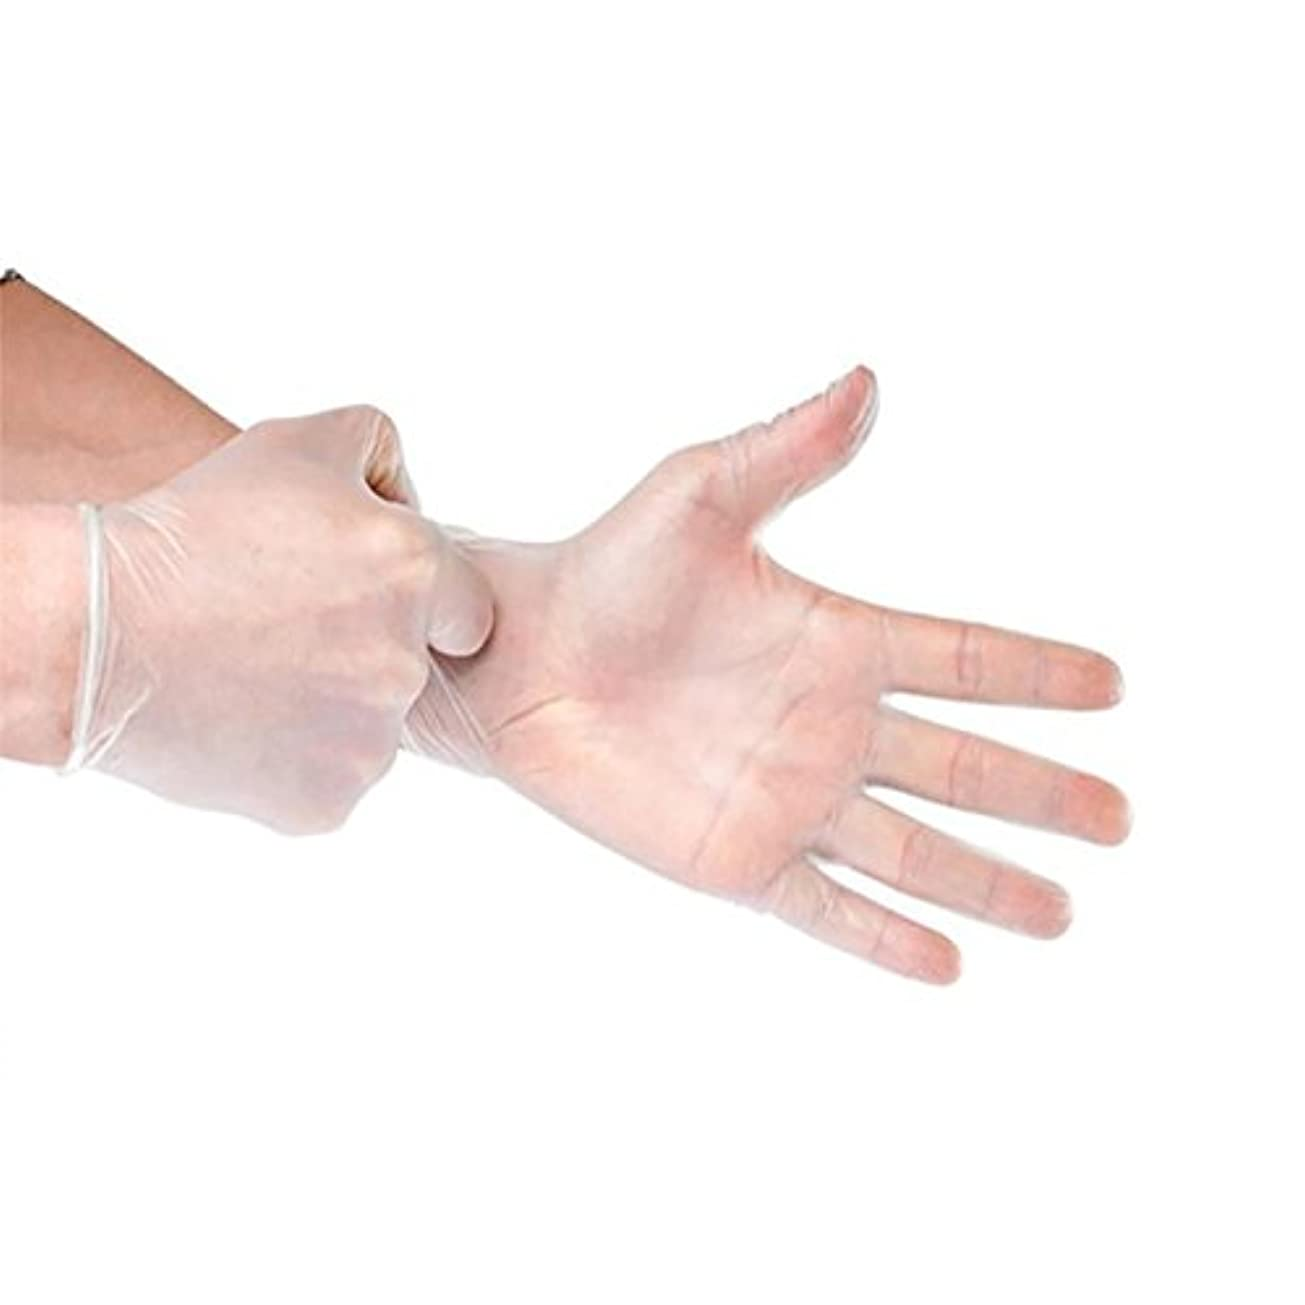 Cozyswan 使い捨て手袋 100枚入り 粉なし検査 料理 絵 清潔 掃除 ペット管理 size M (透明)